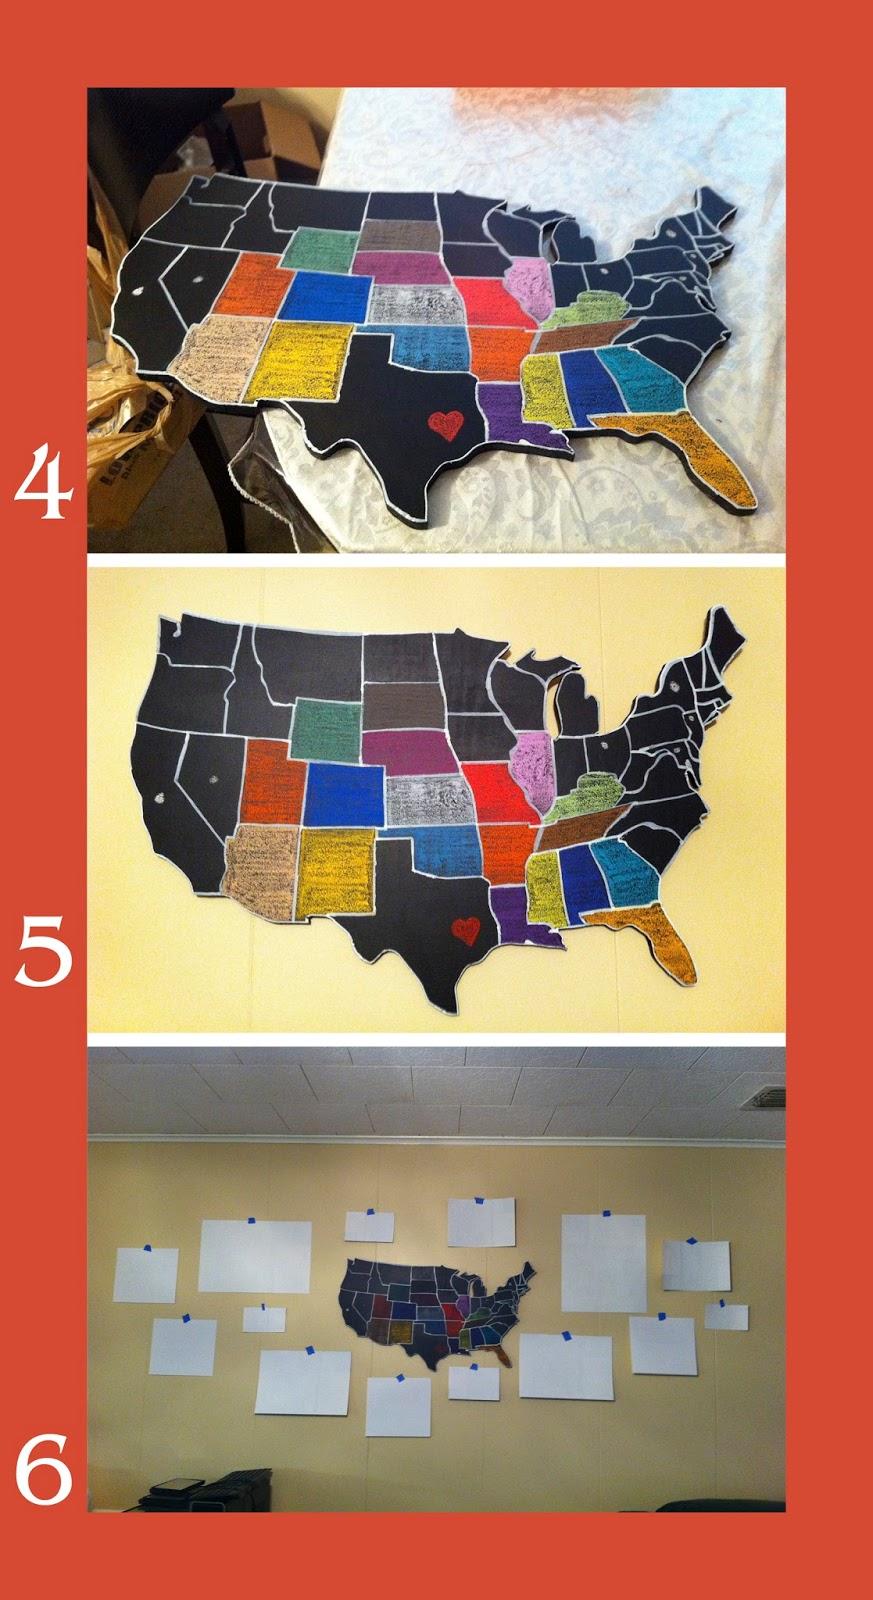 scraps of life us map wall art. Black Bedroom Furniture Sets. Home Design Ideas